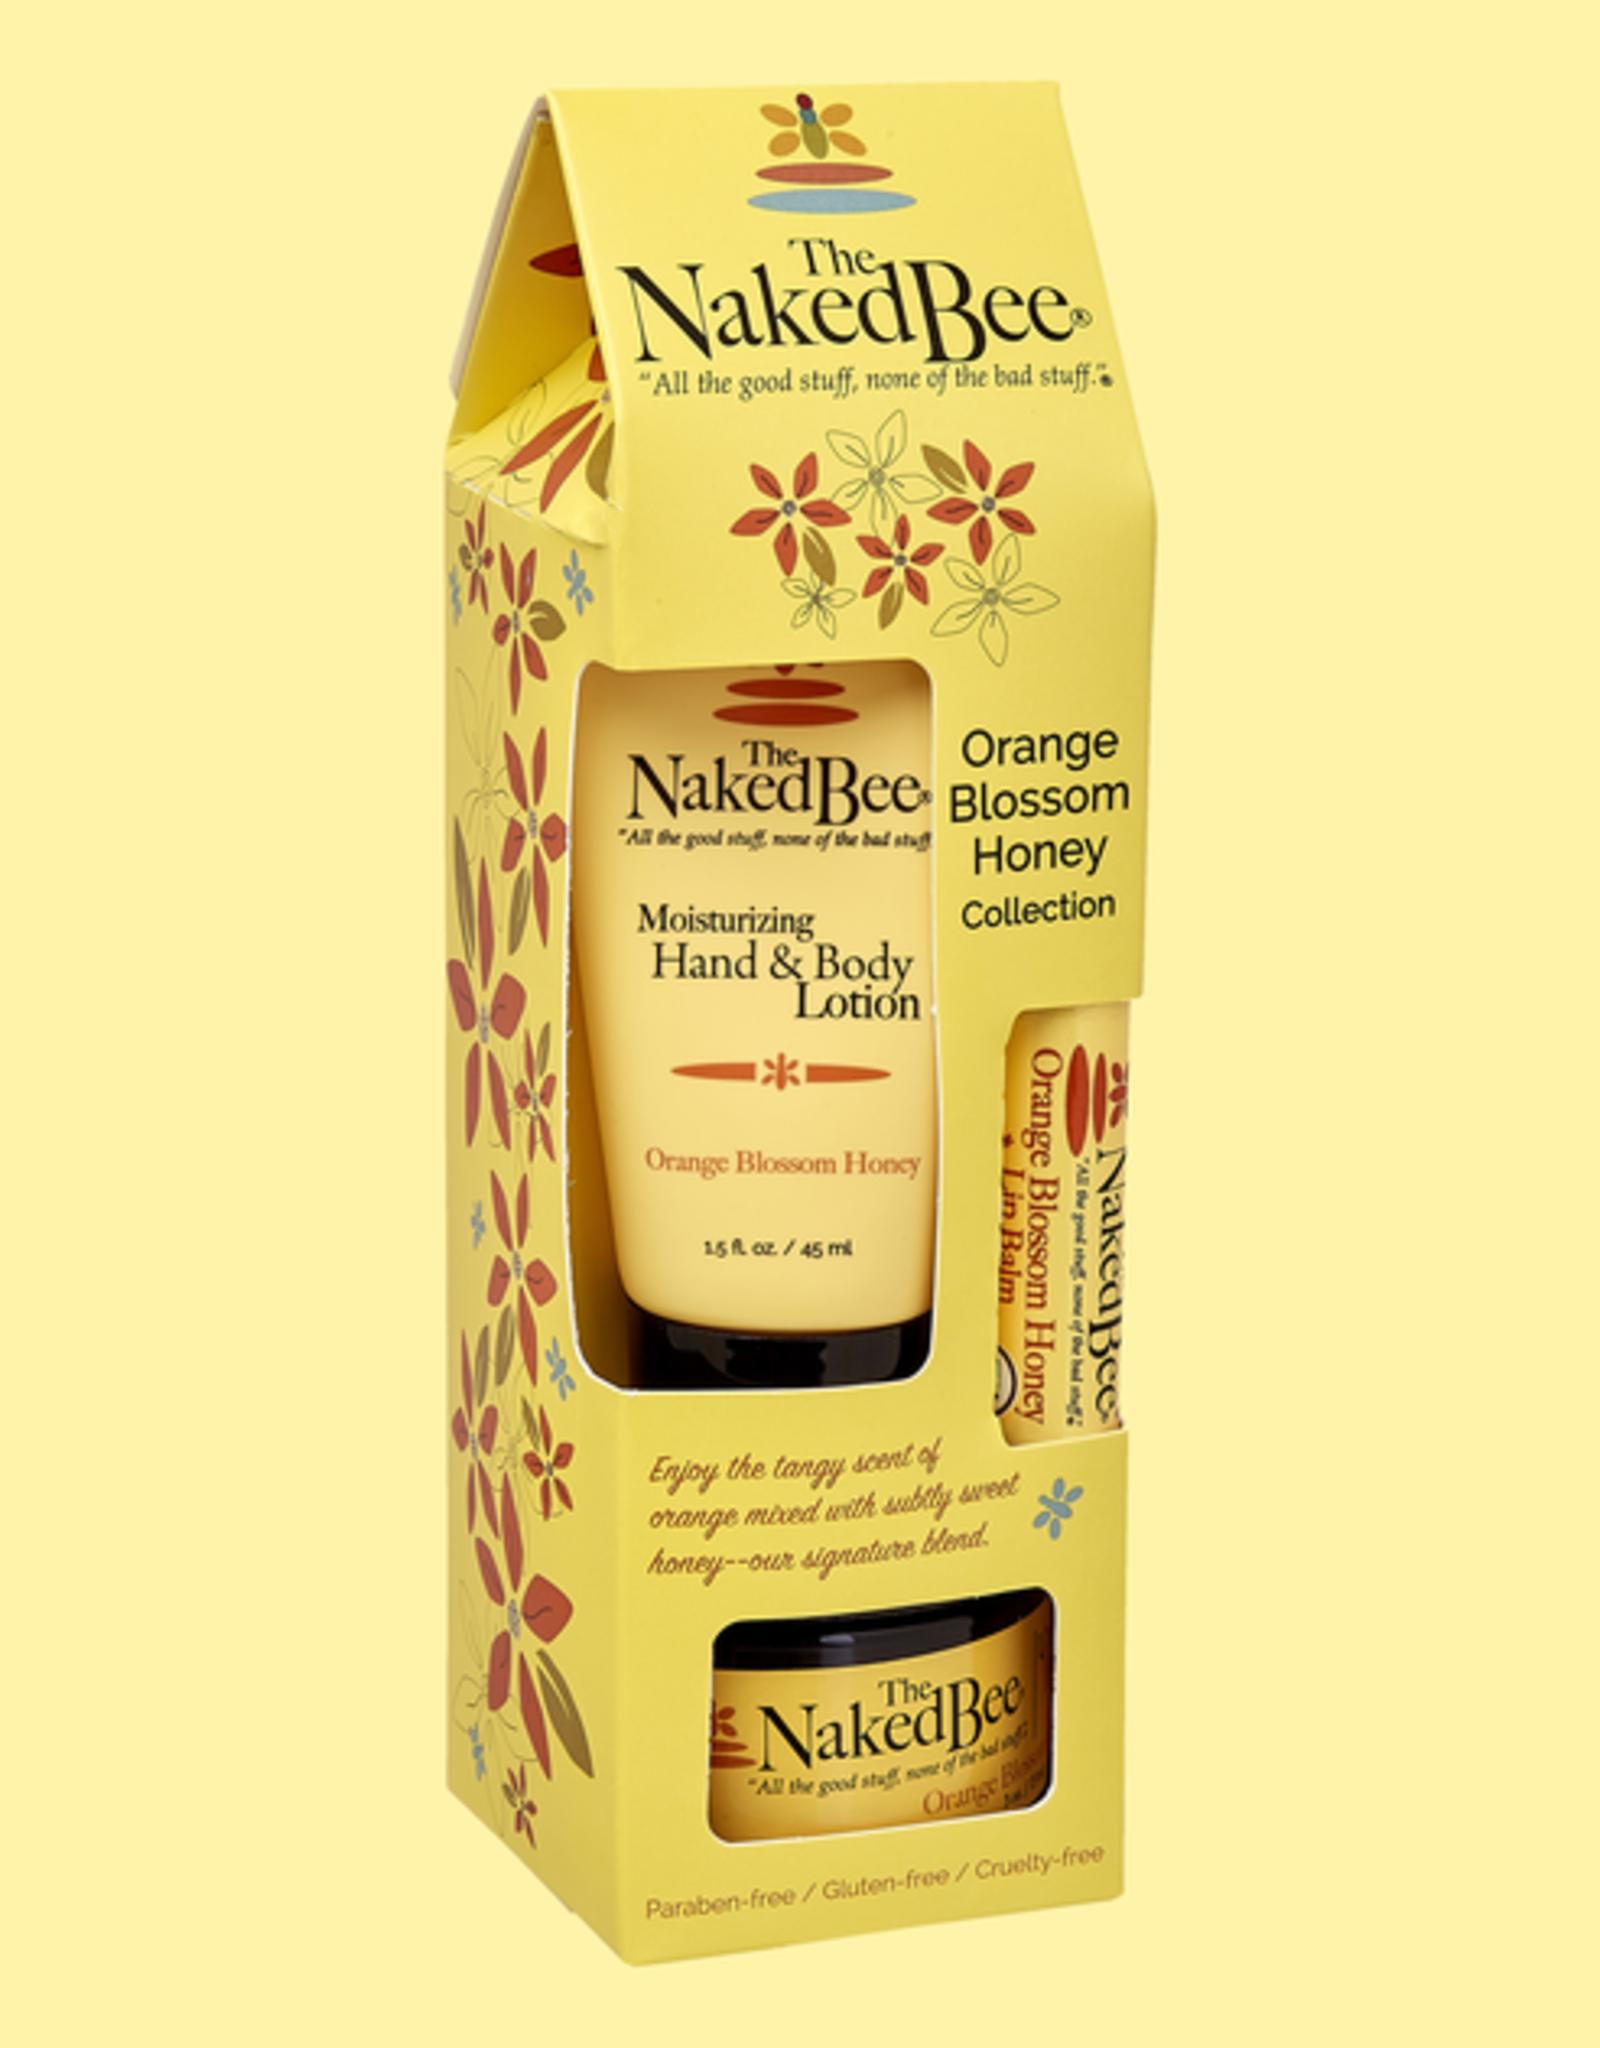 The Naked Bee The Naked Bee | Orange Blossom Honey Gift Set